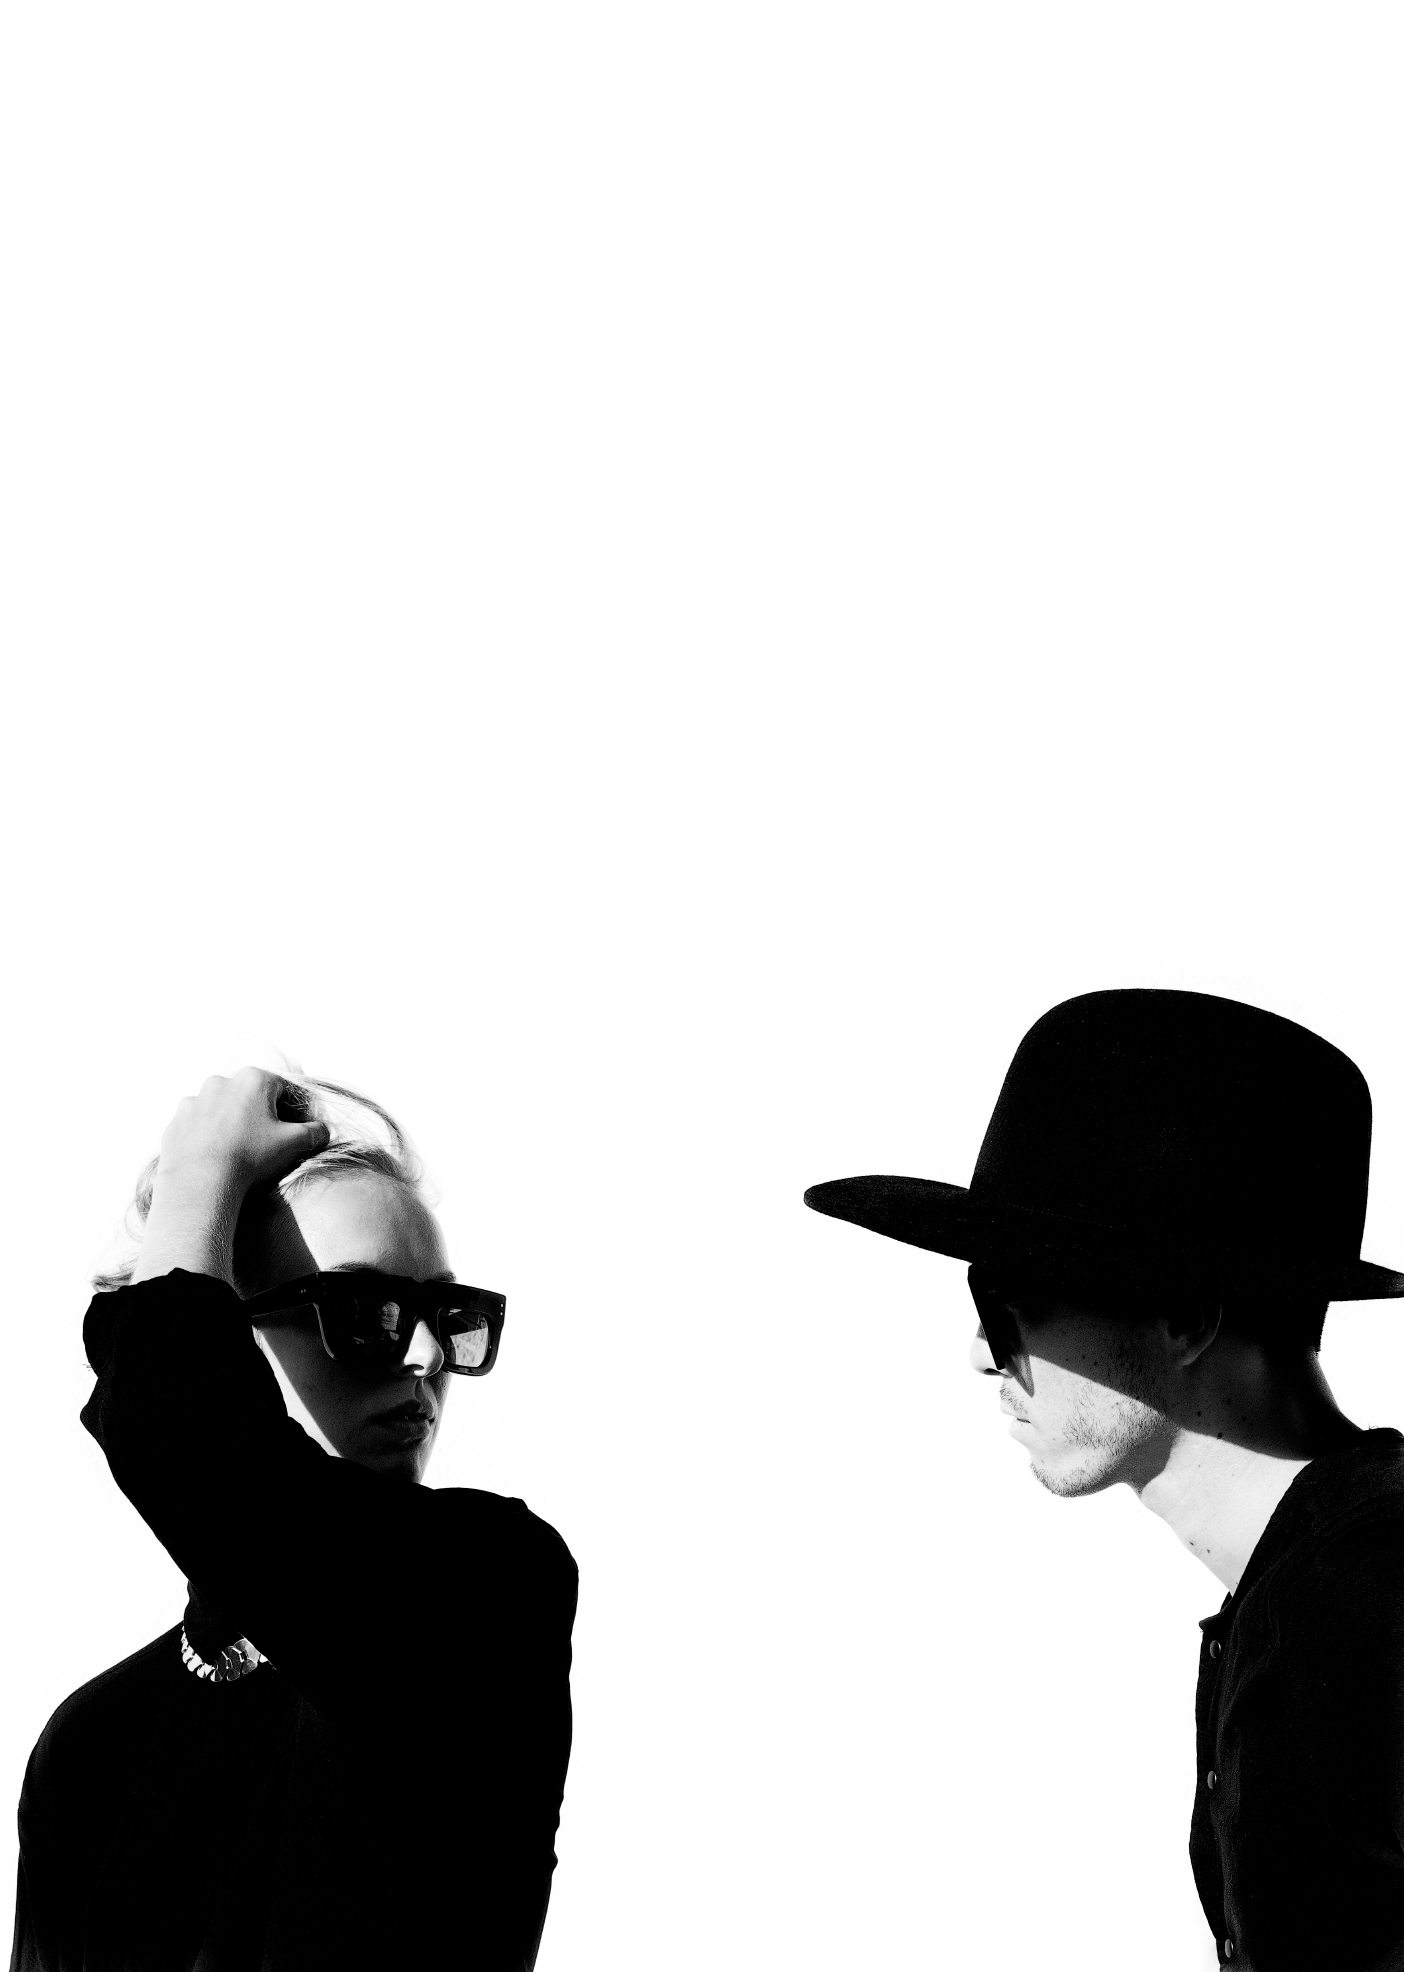 Wilde_Sunglasses_model-Teppey_Anna-Collection-2016_barcelona-.jpg